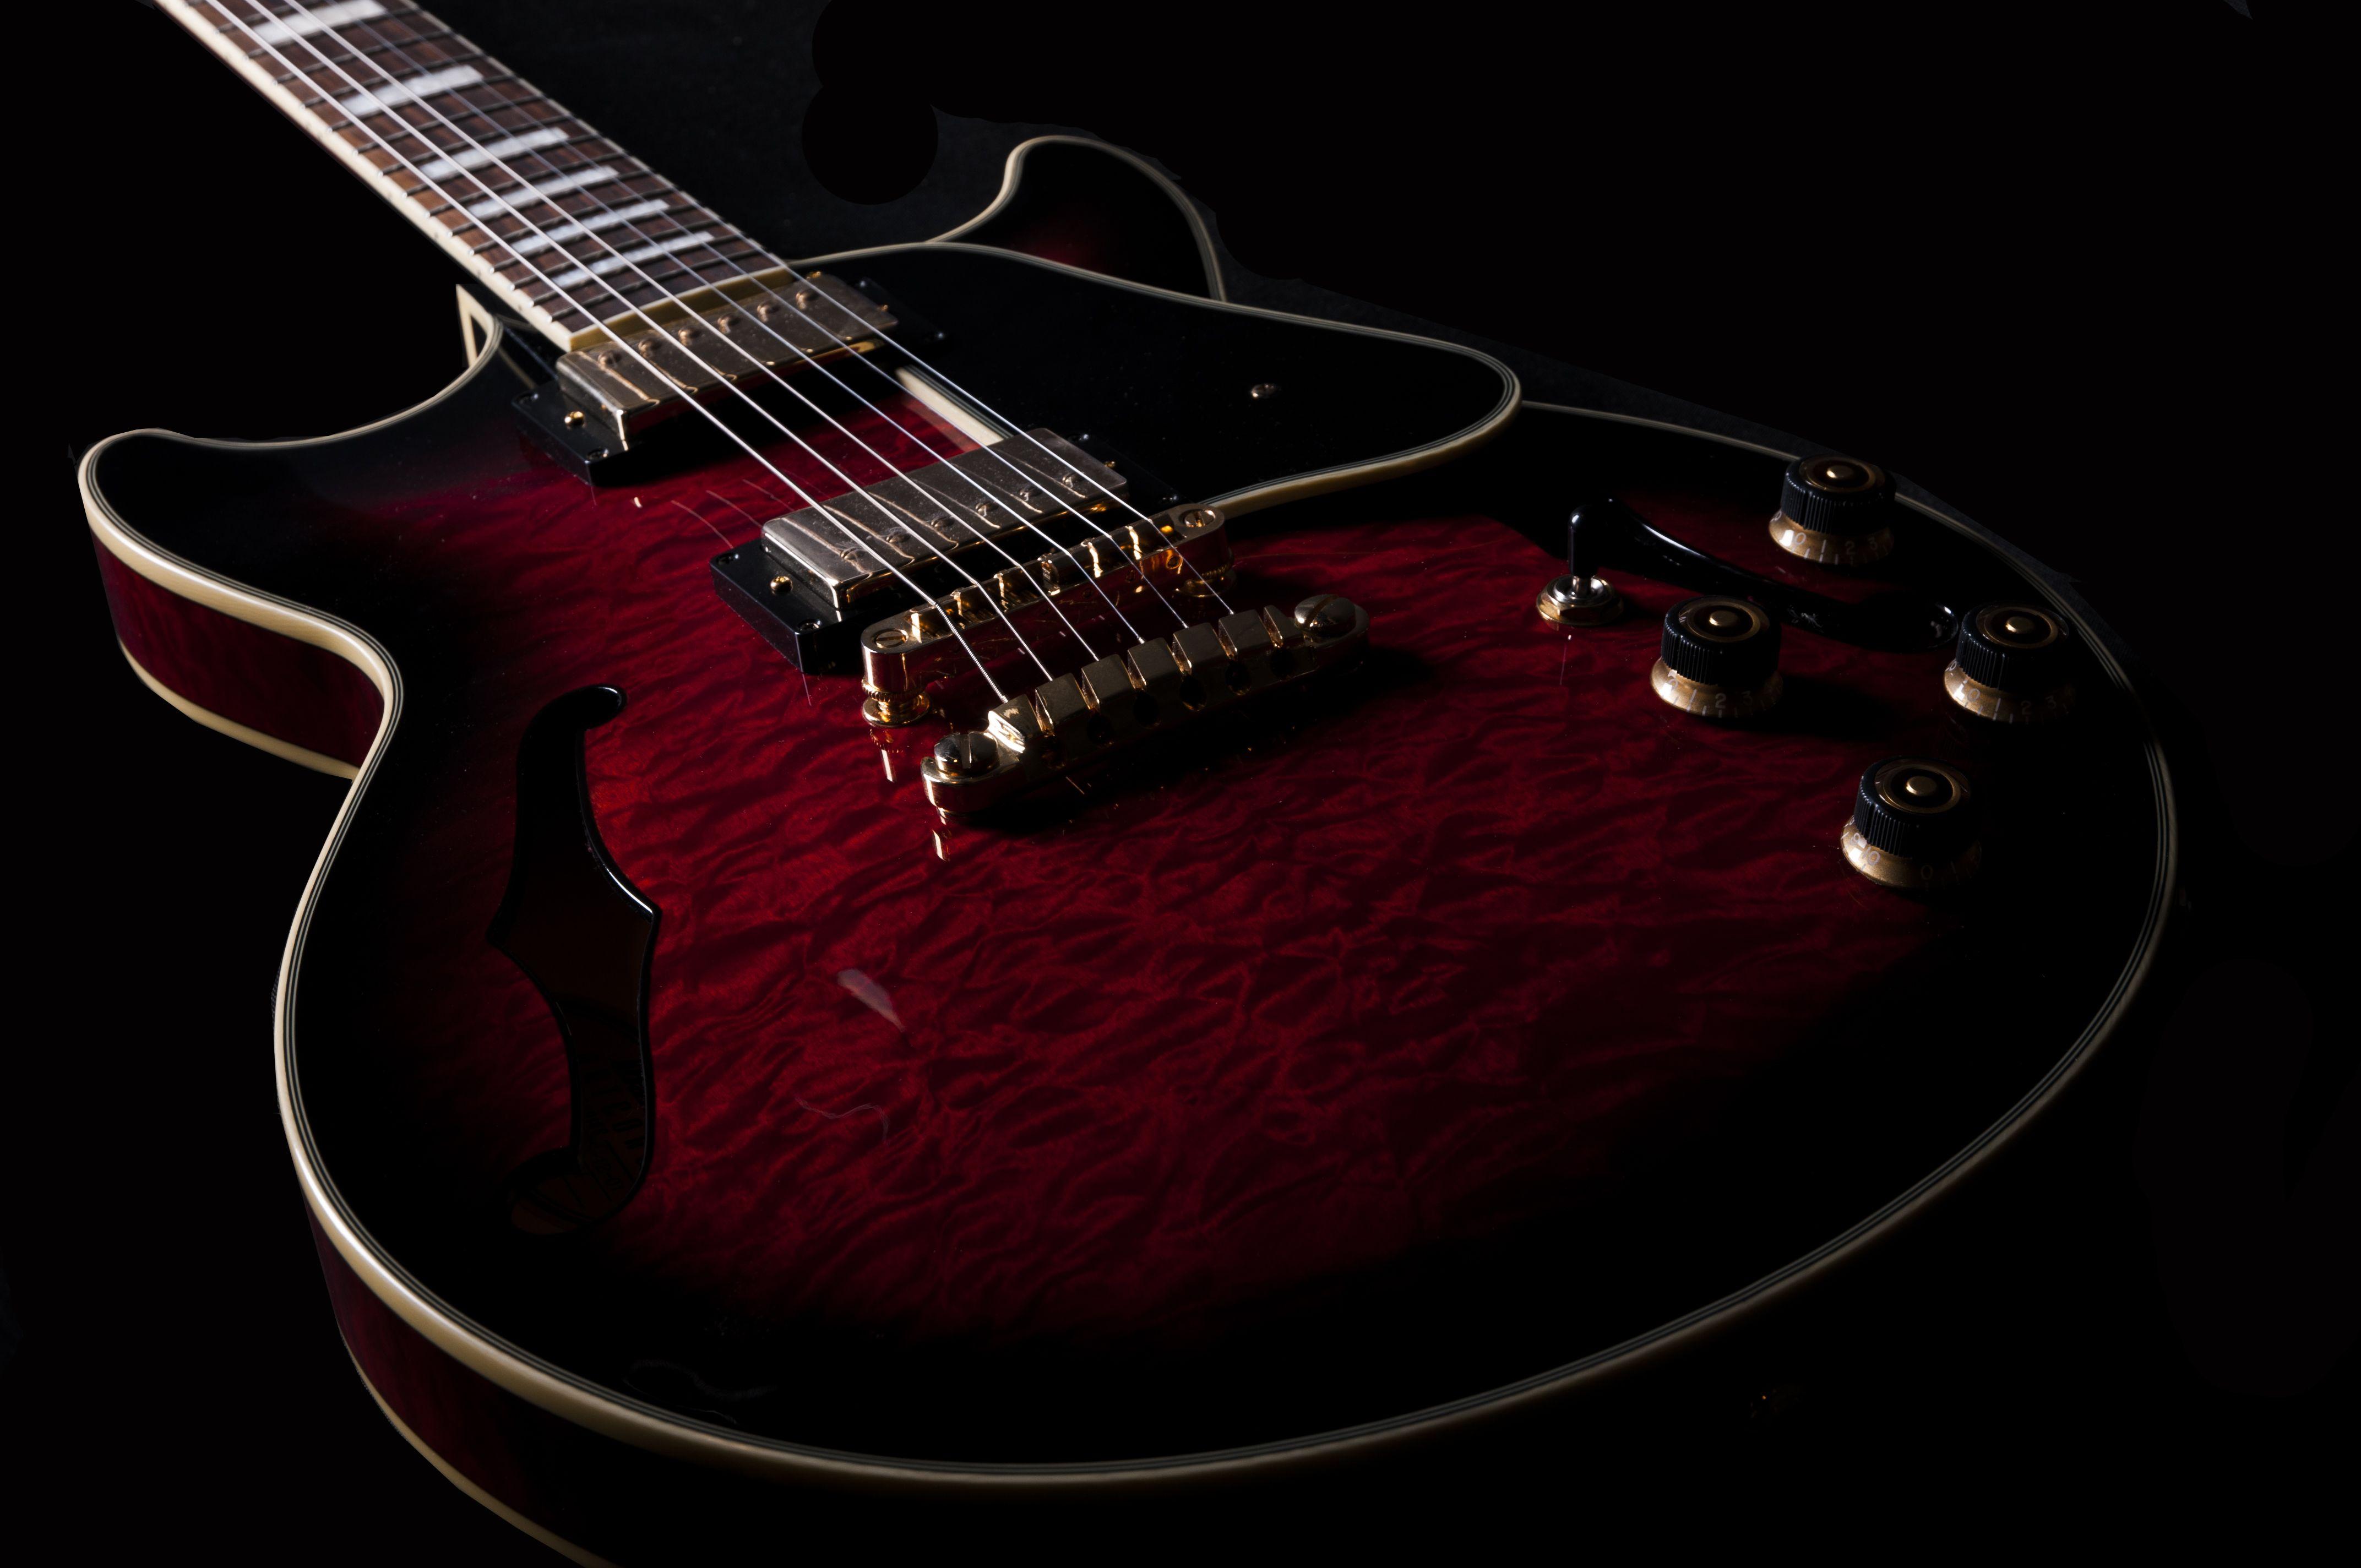 Guitar Red Lighting